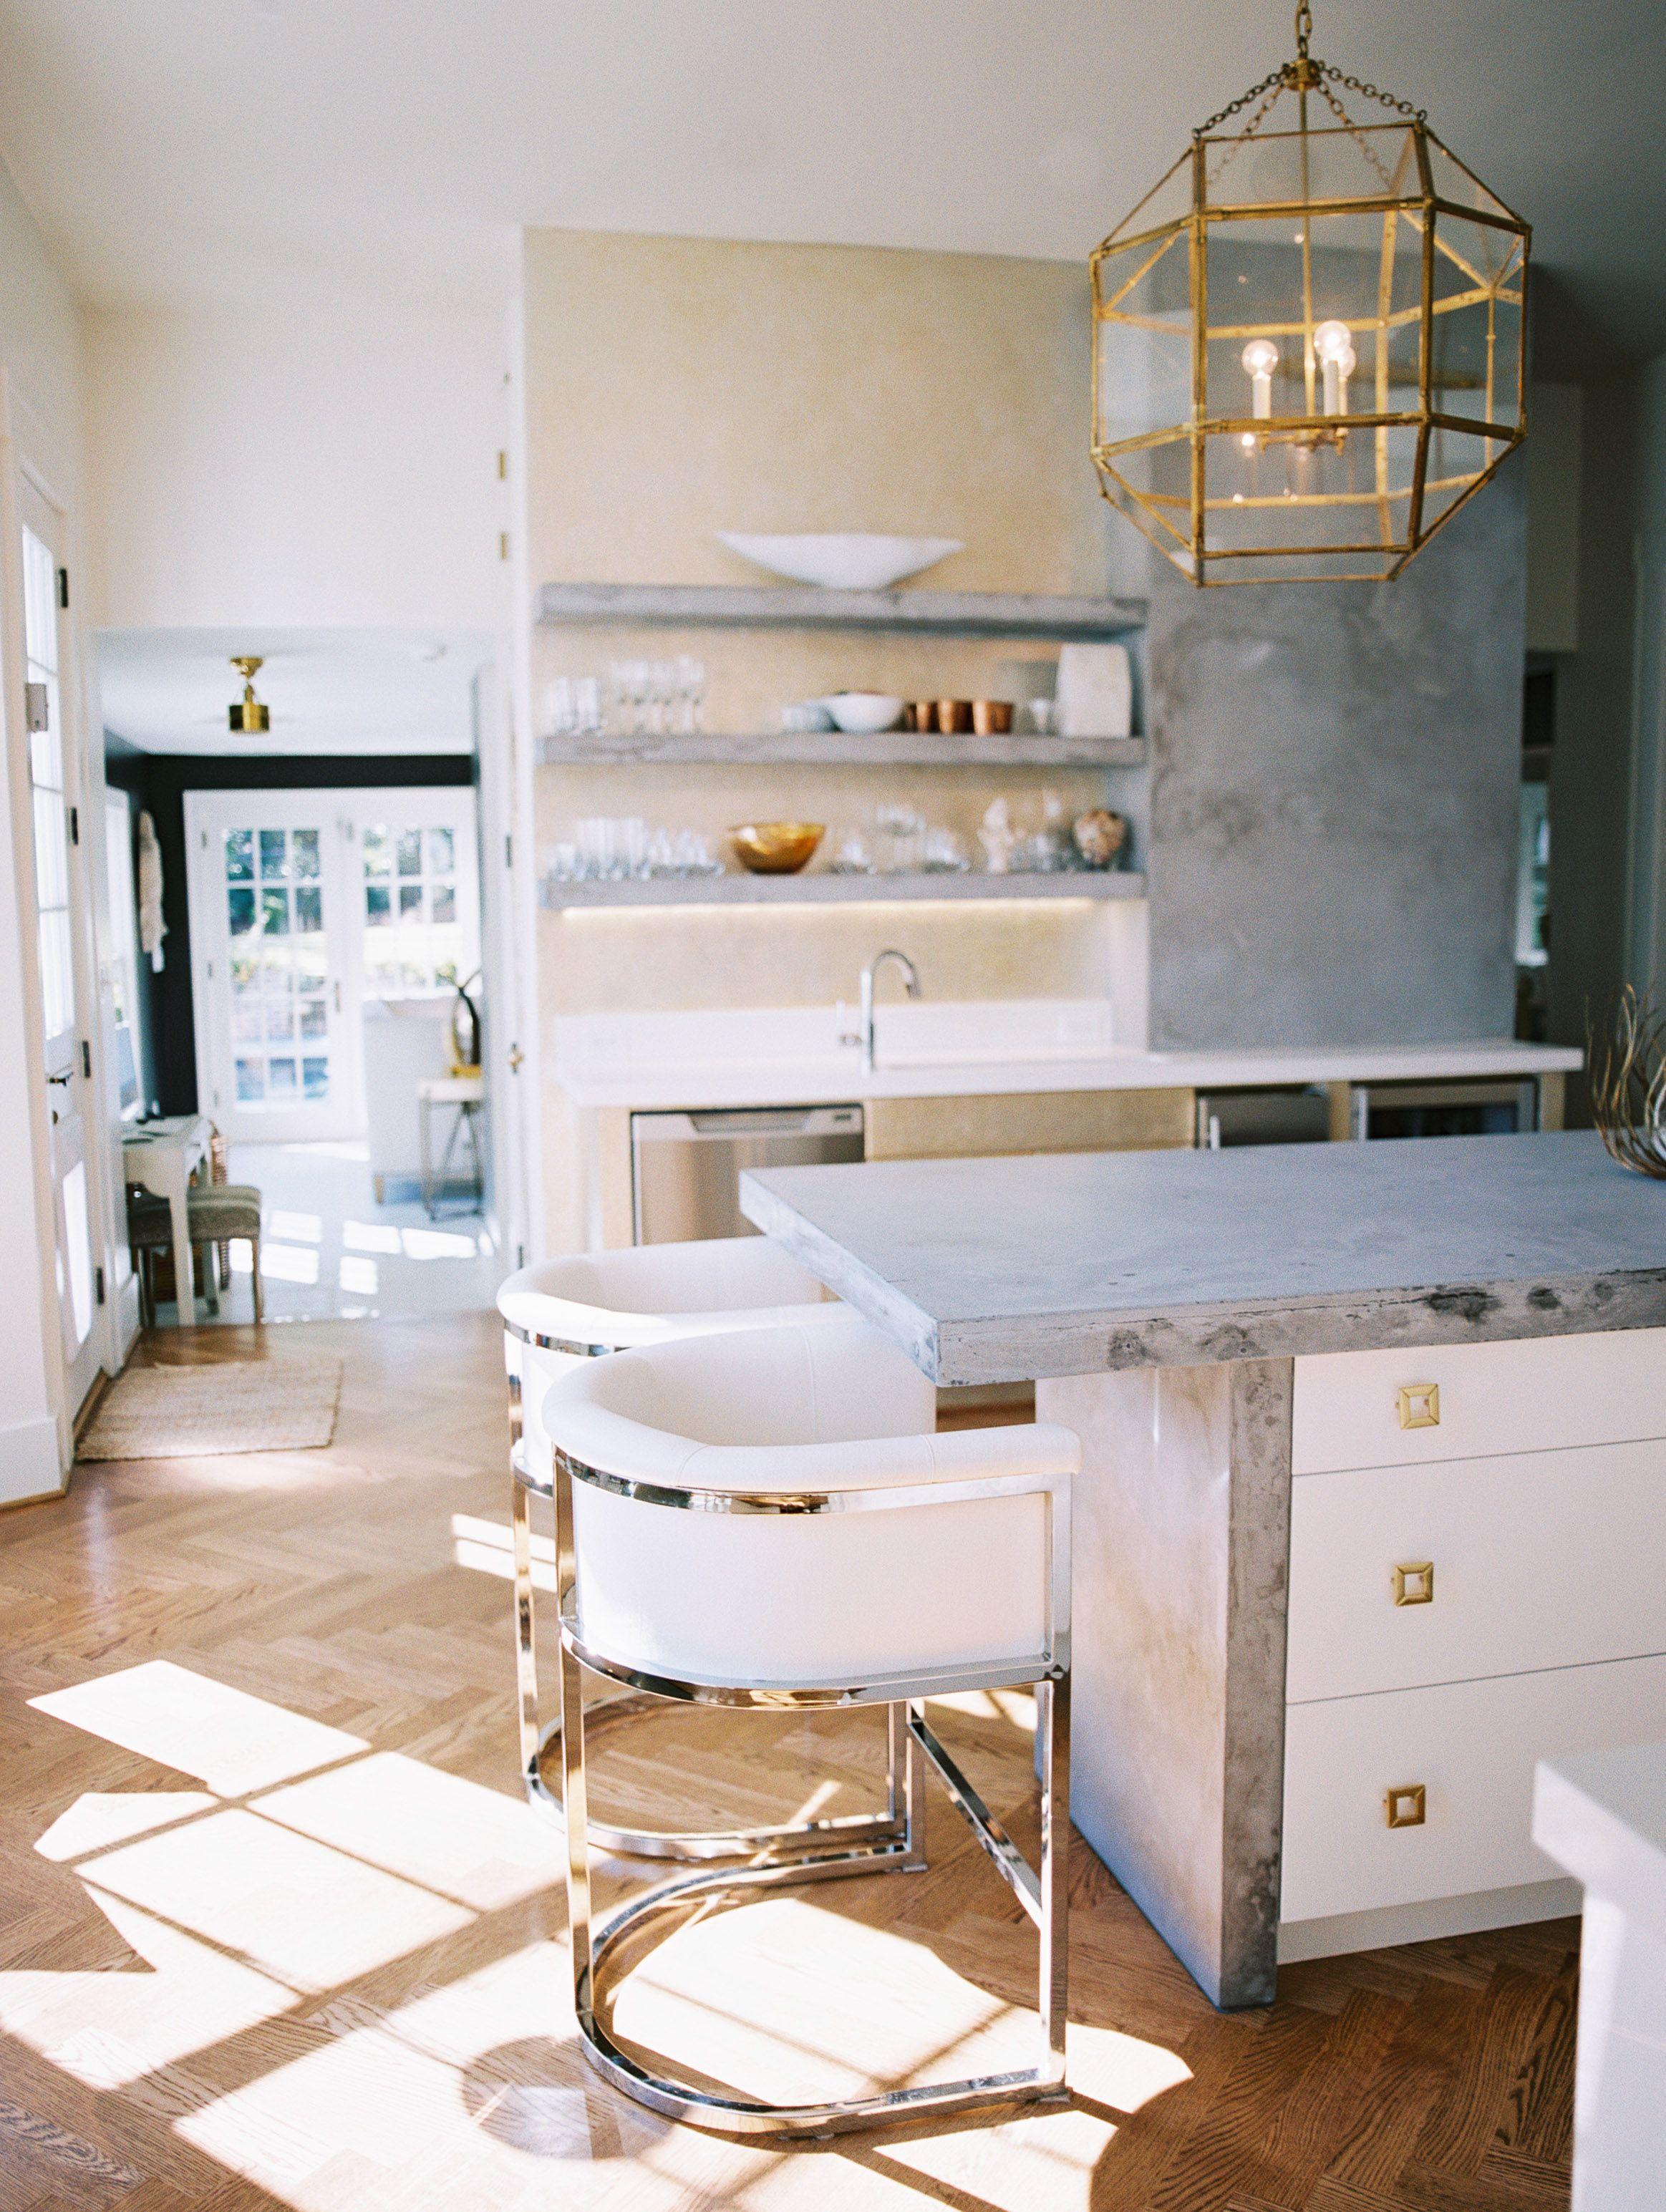 Modern Kitchen with concrete countertops with herringbone floors ...